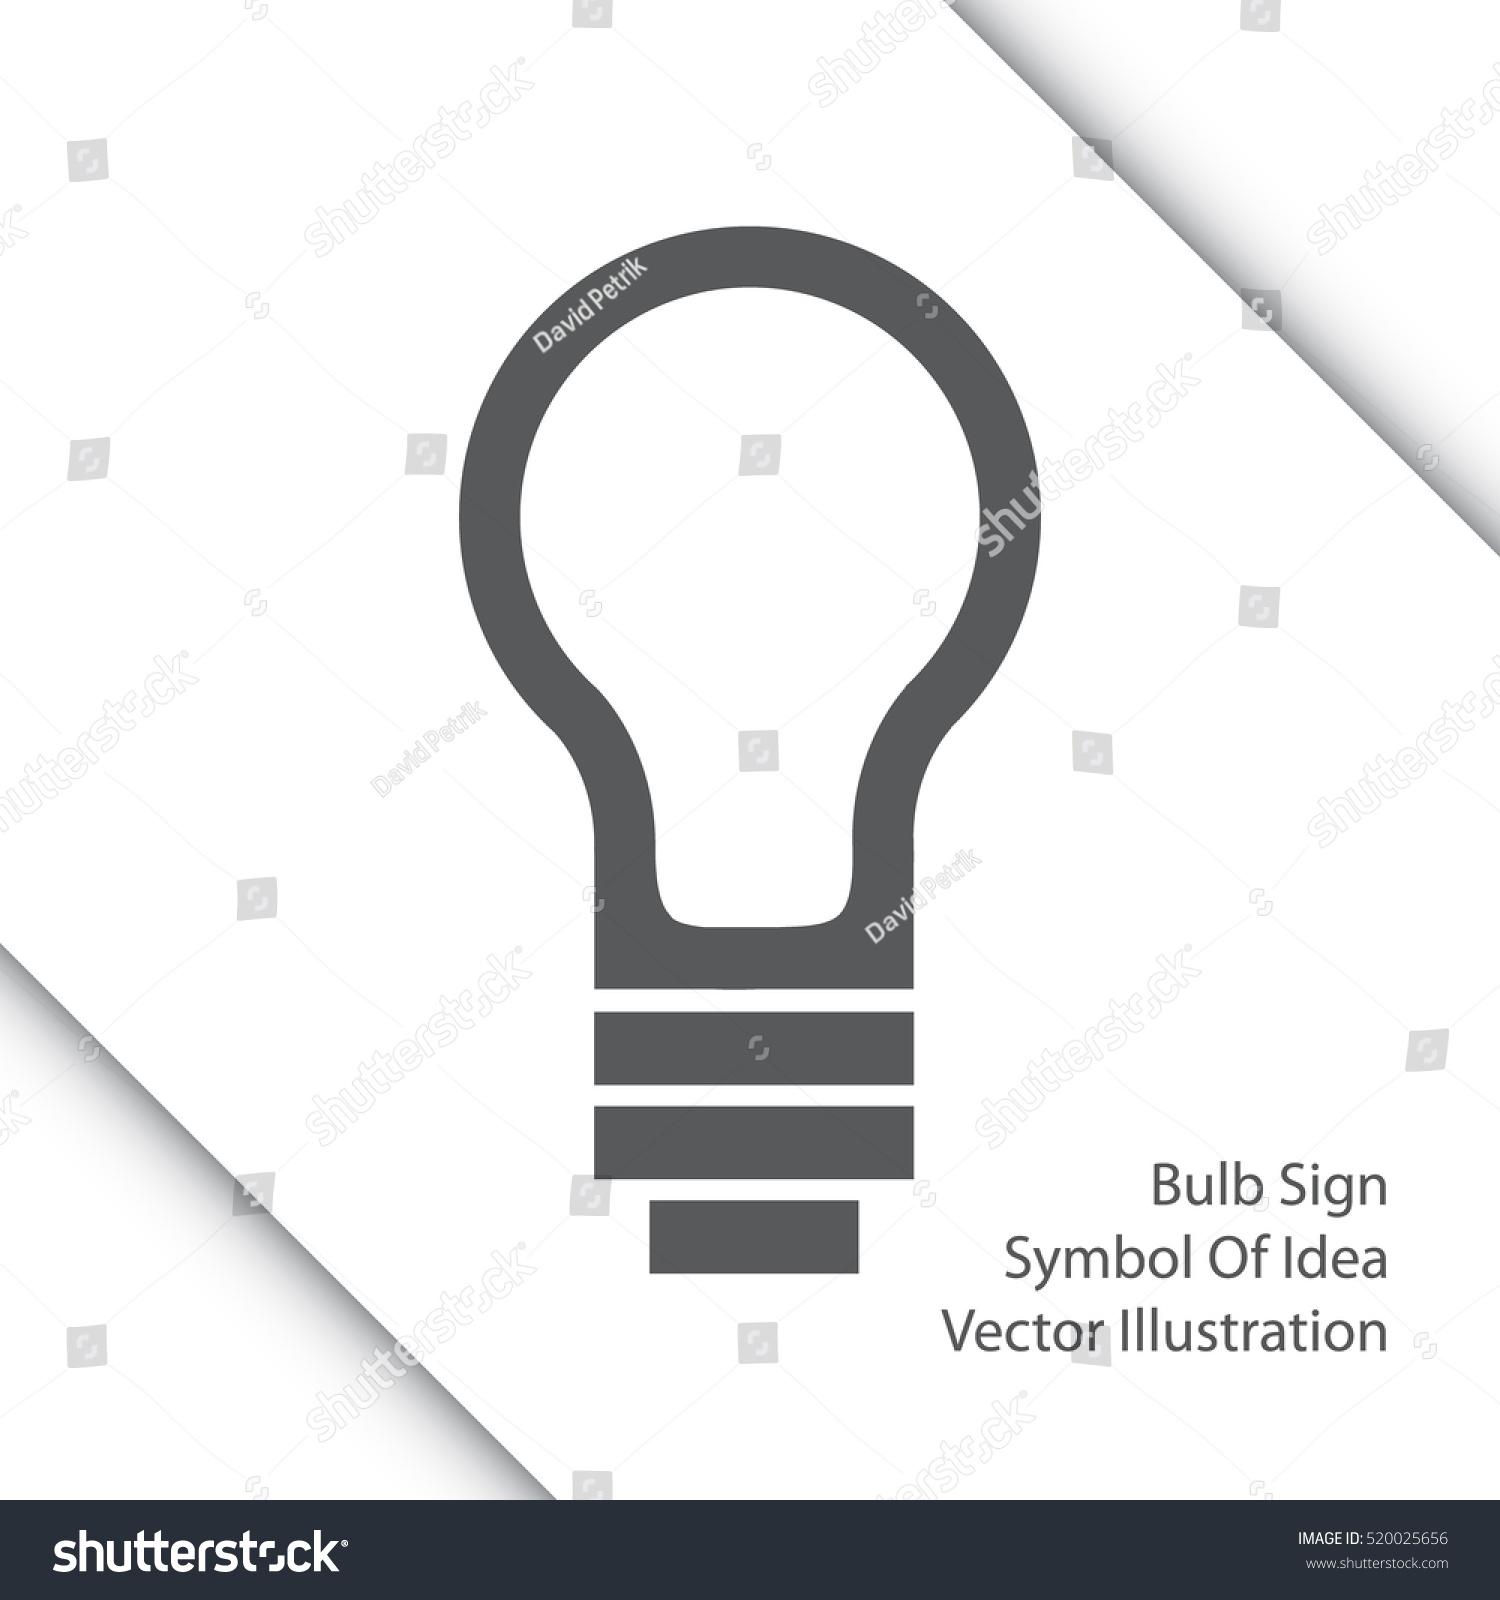 Light bulb line icon sign thinking stock vector 520025656 sign of thinking new idea vector illustration biocorpaavc